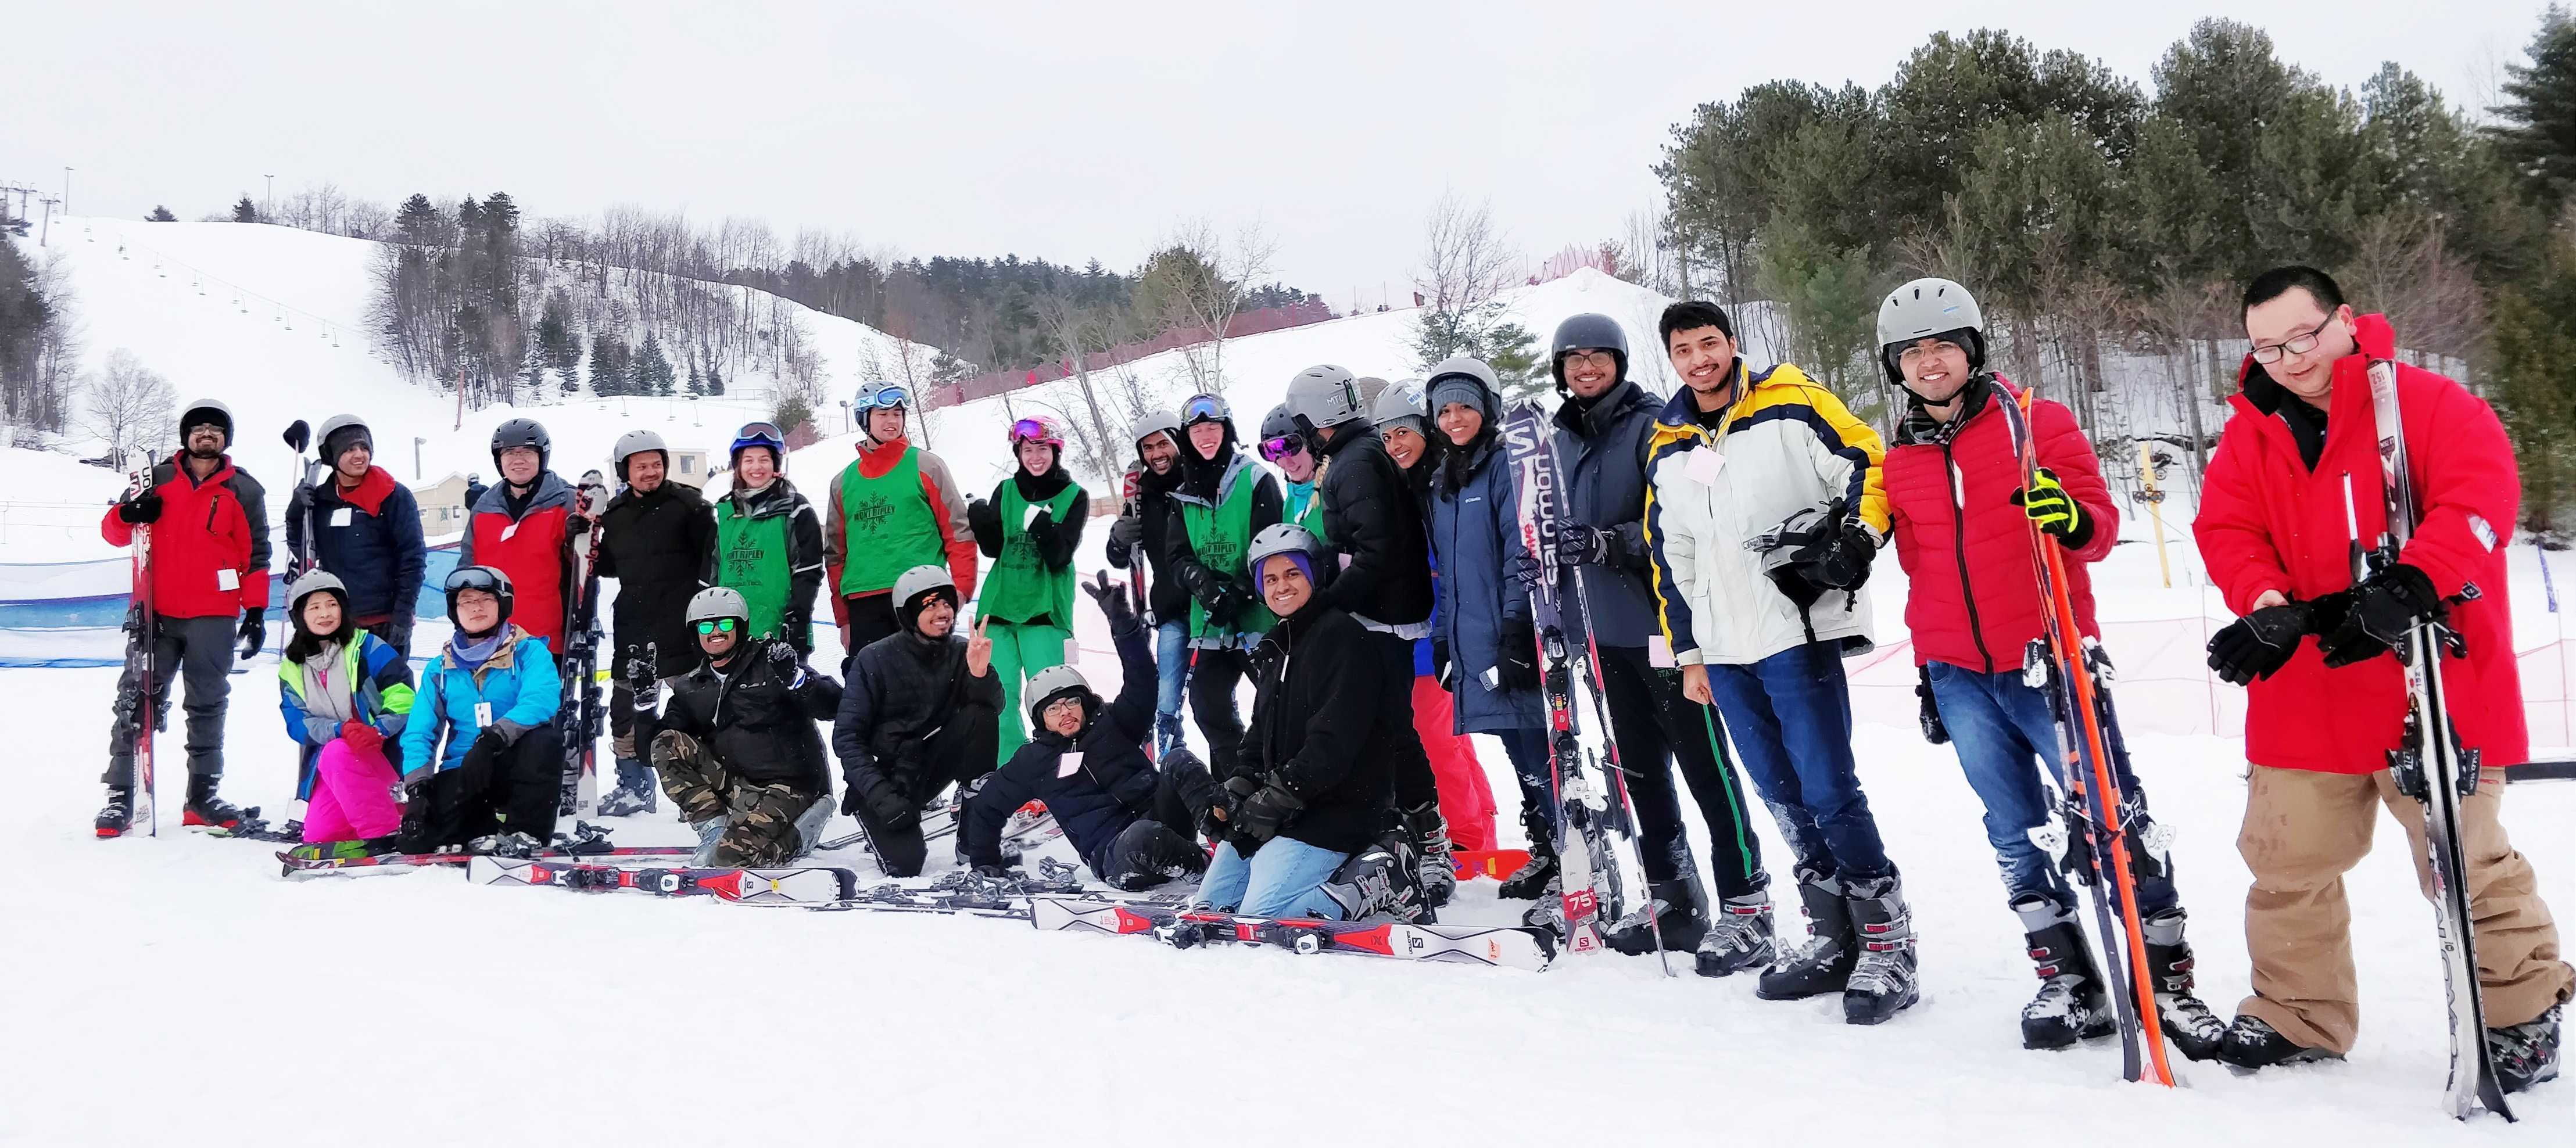 International Ski Day: Creating a new hobby